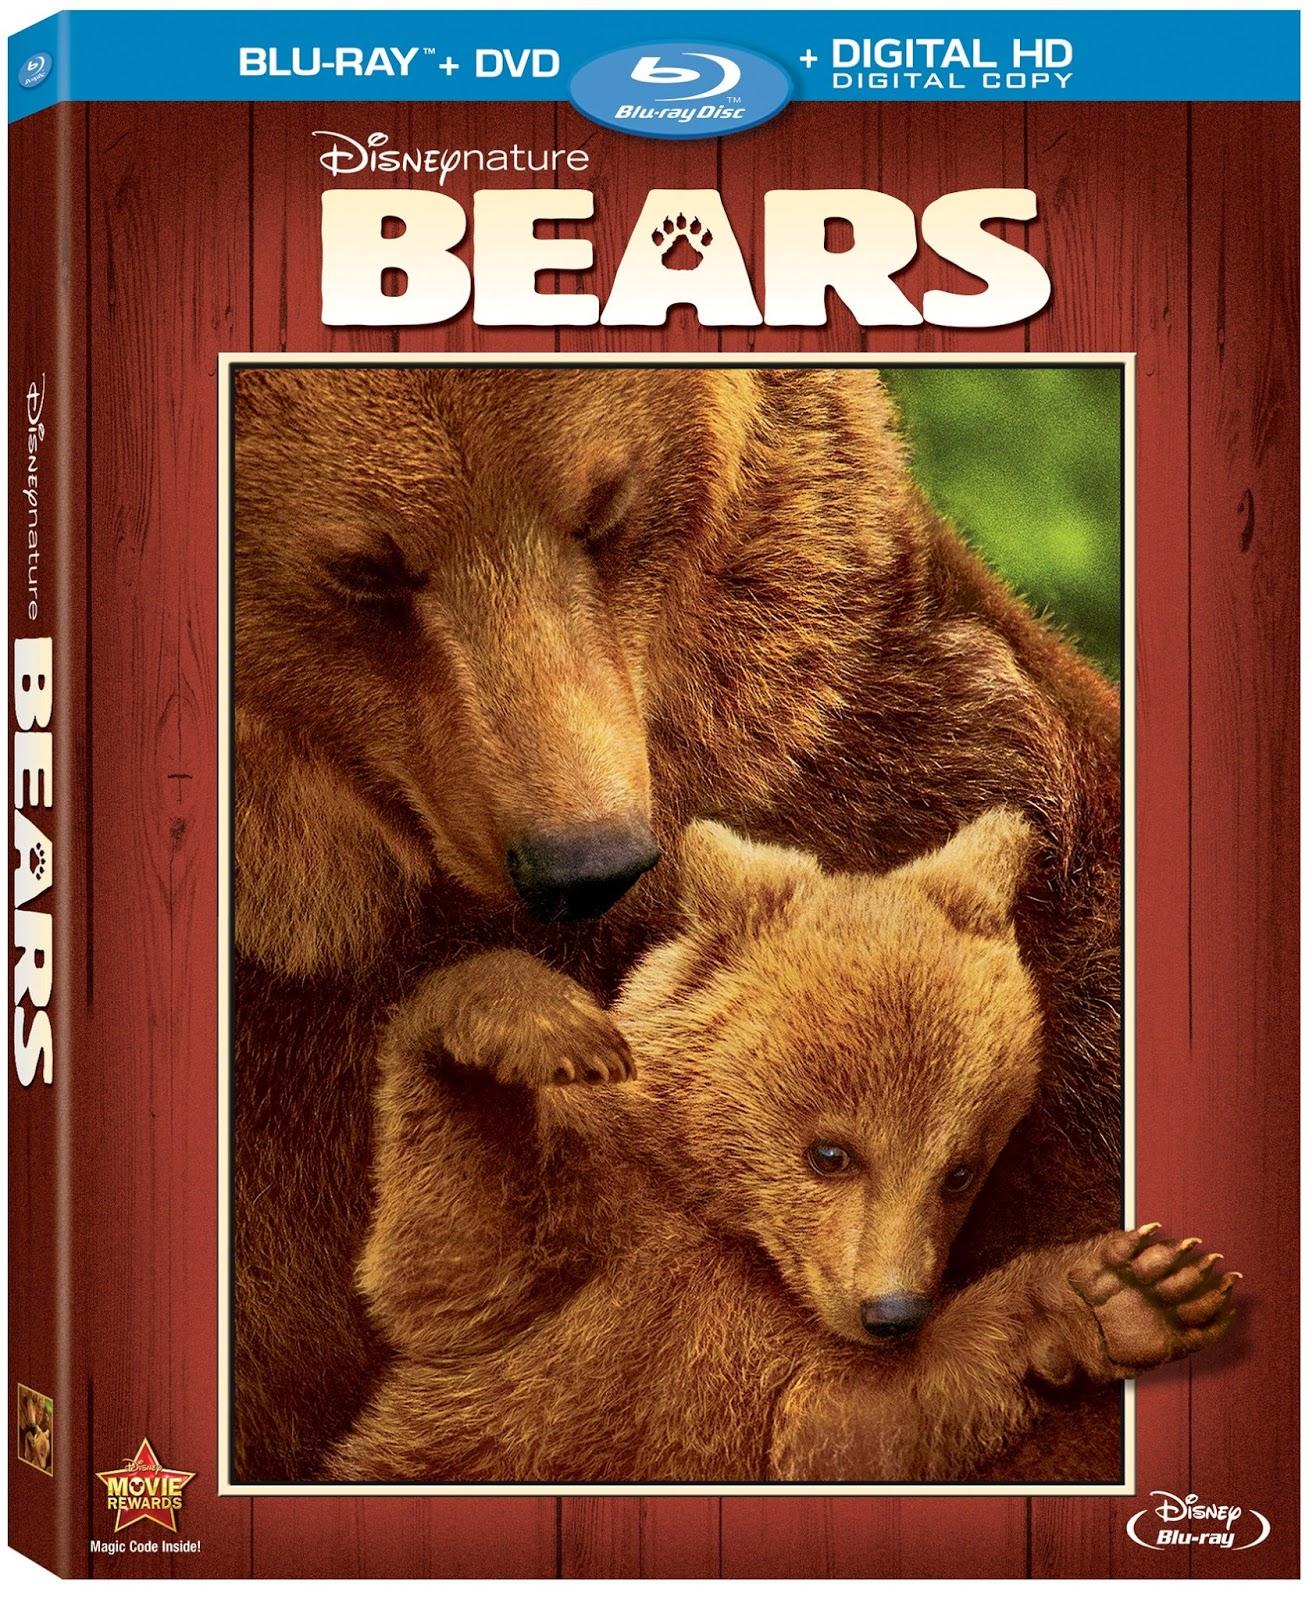 Bears+Disneynature+Released+Blu-ray+Combo+August+2014